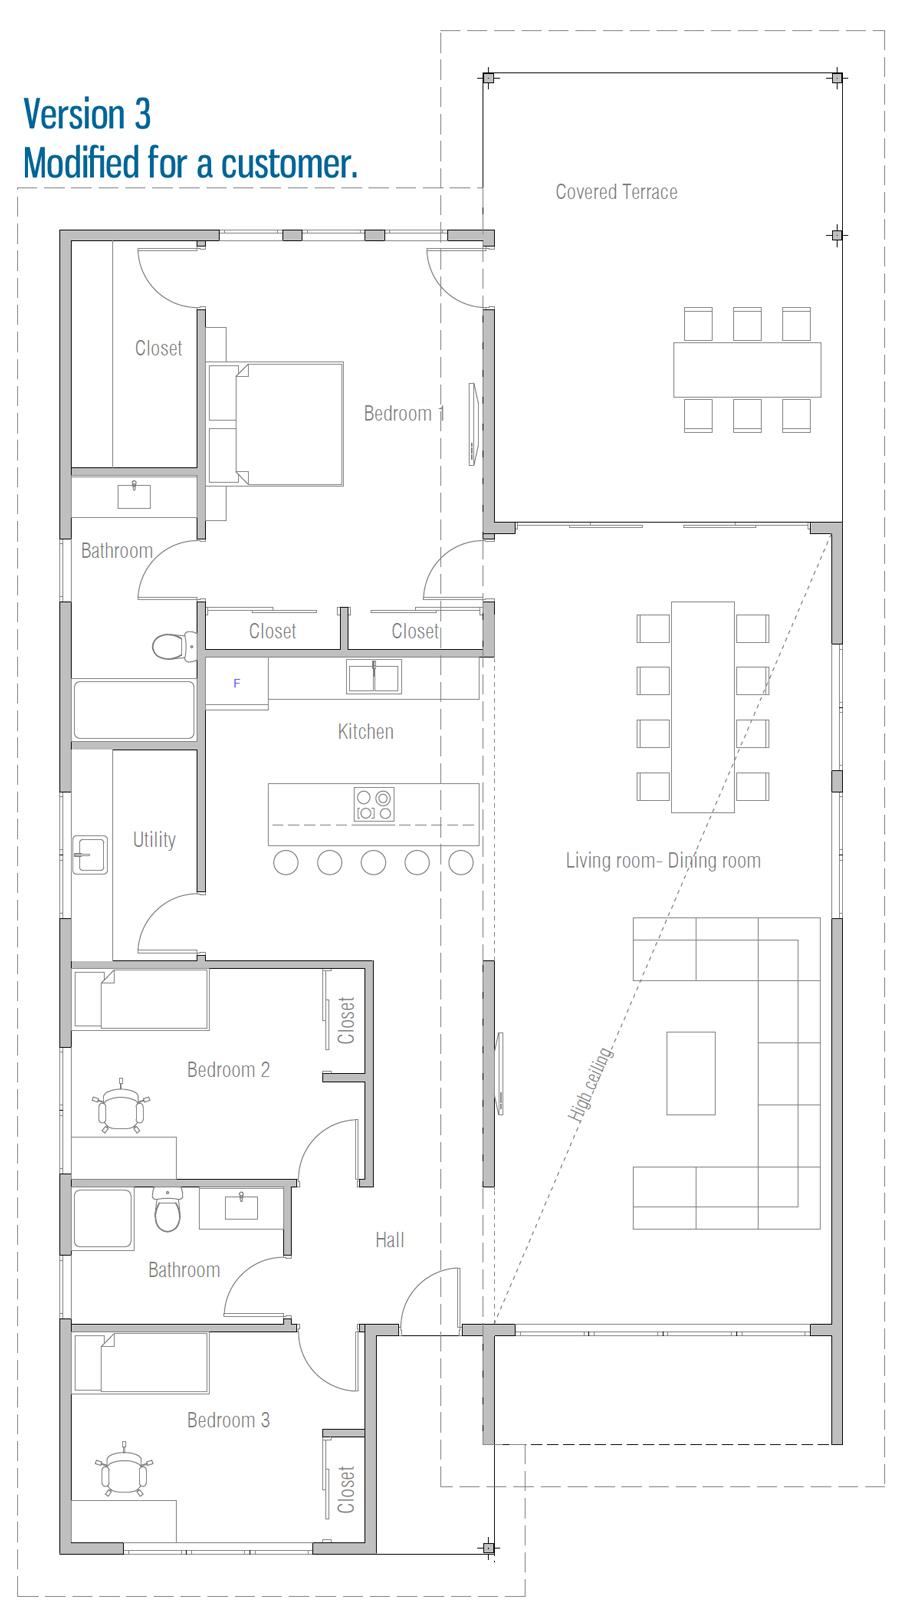 house-plans-2020_40_home_plan_CH614_V3.jpg